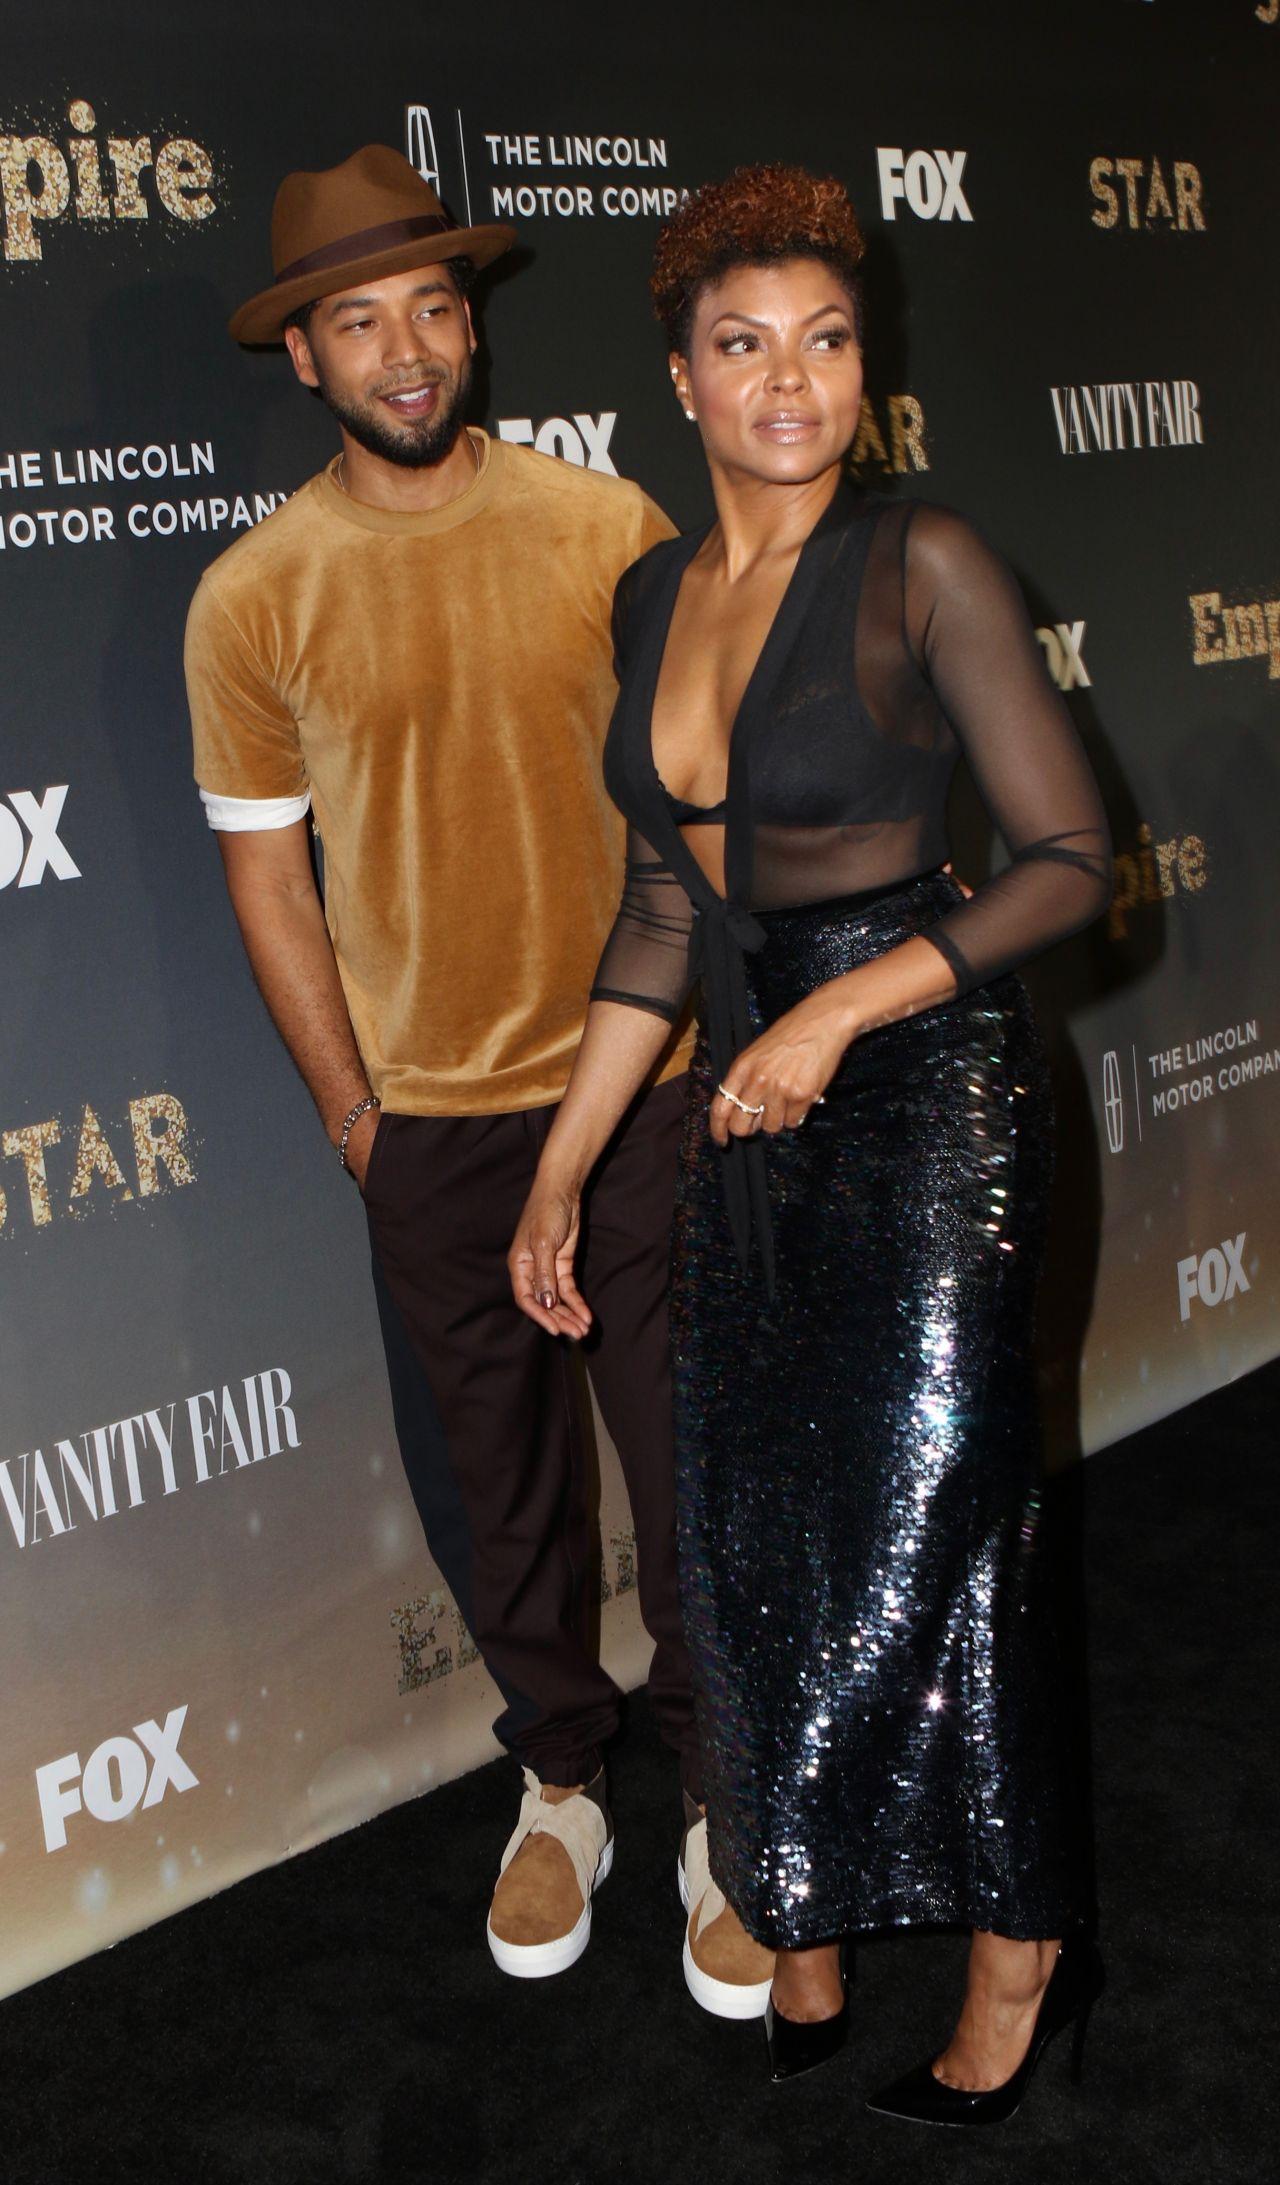 Taraji P. Henson To Star In Empire Spin-Off On Fox - The